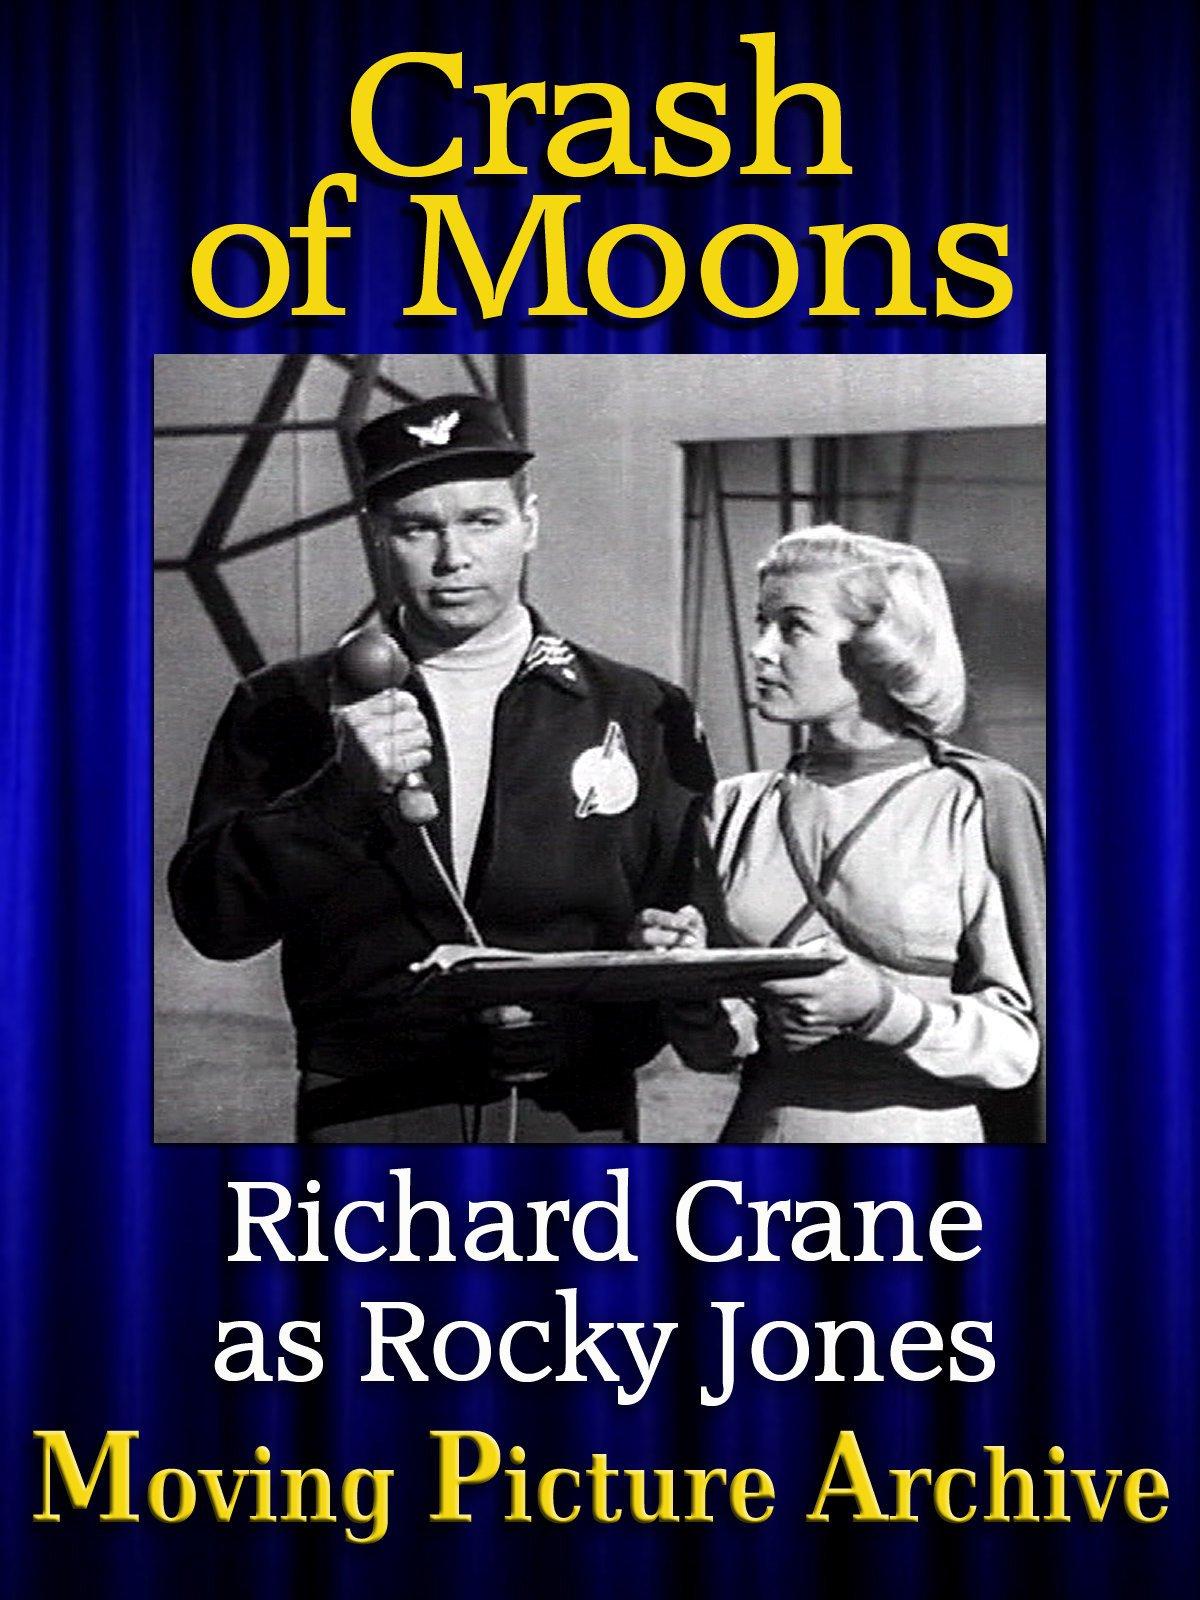 Crash of Moons - 1954